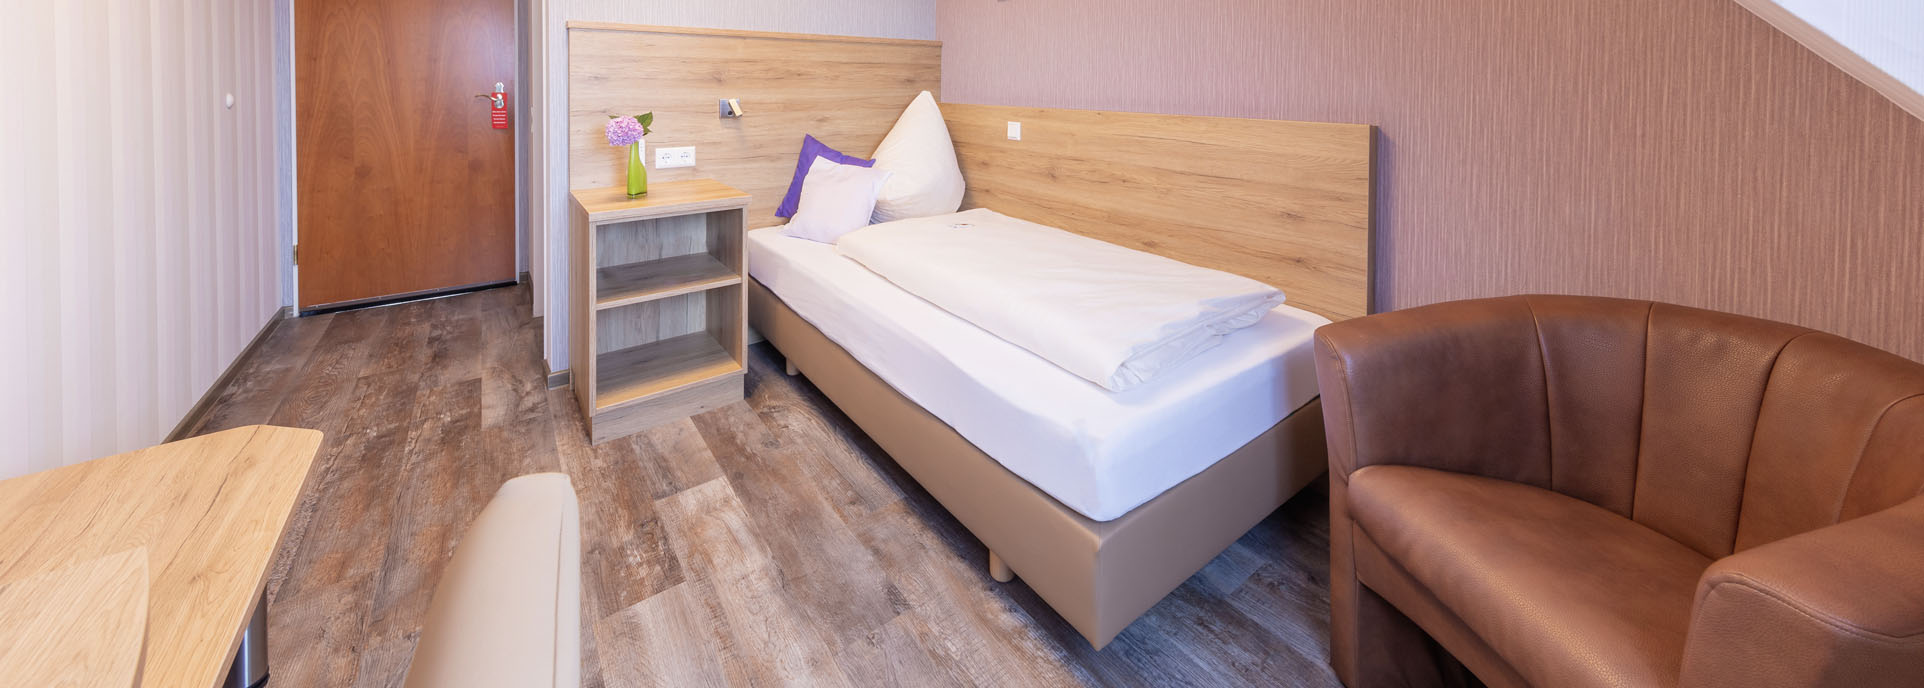 hotel_reinhardtshof_slide_05